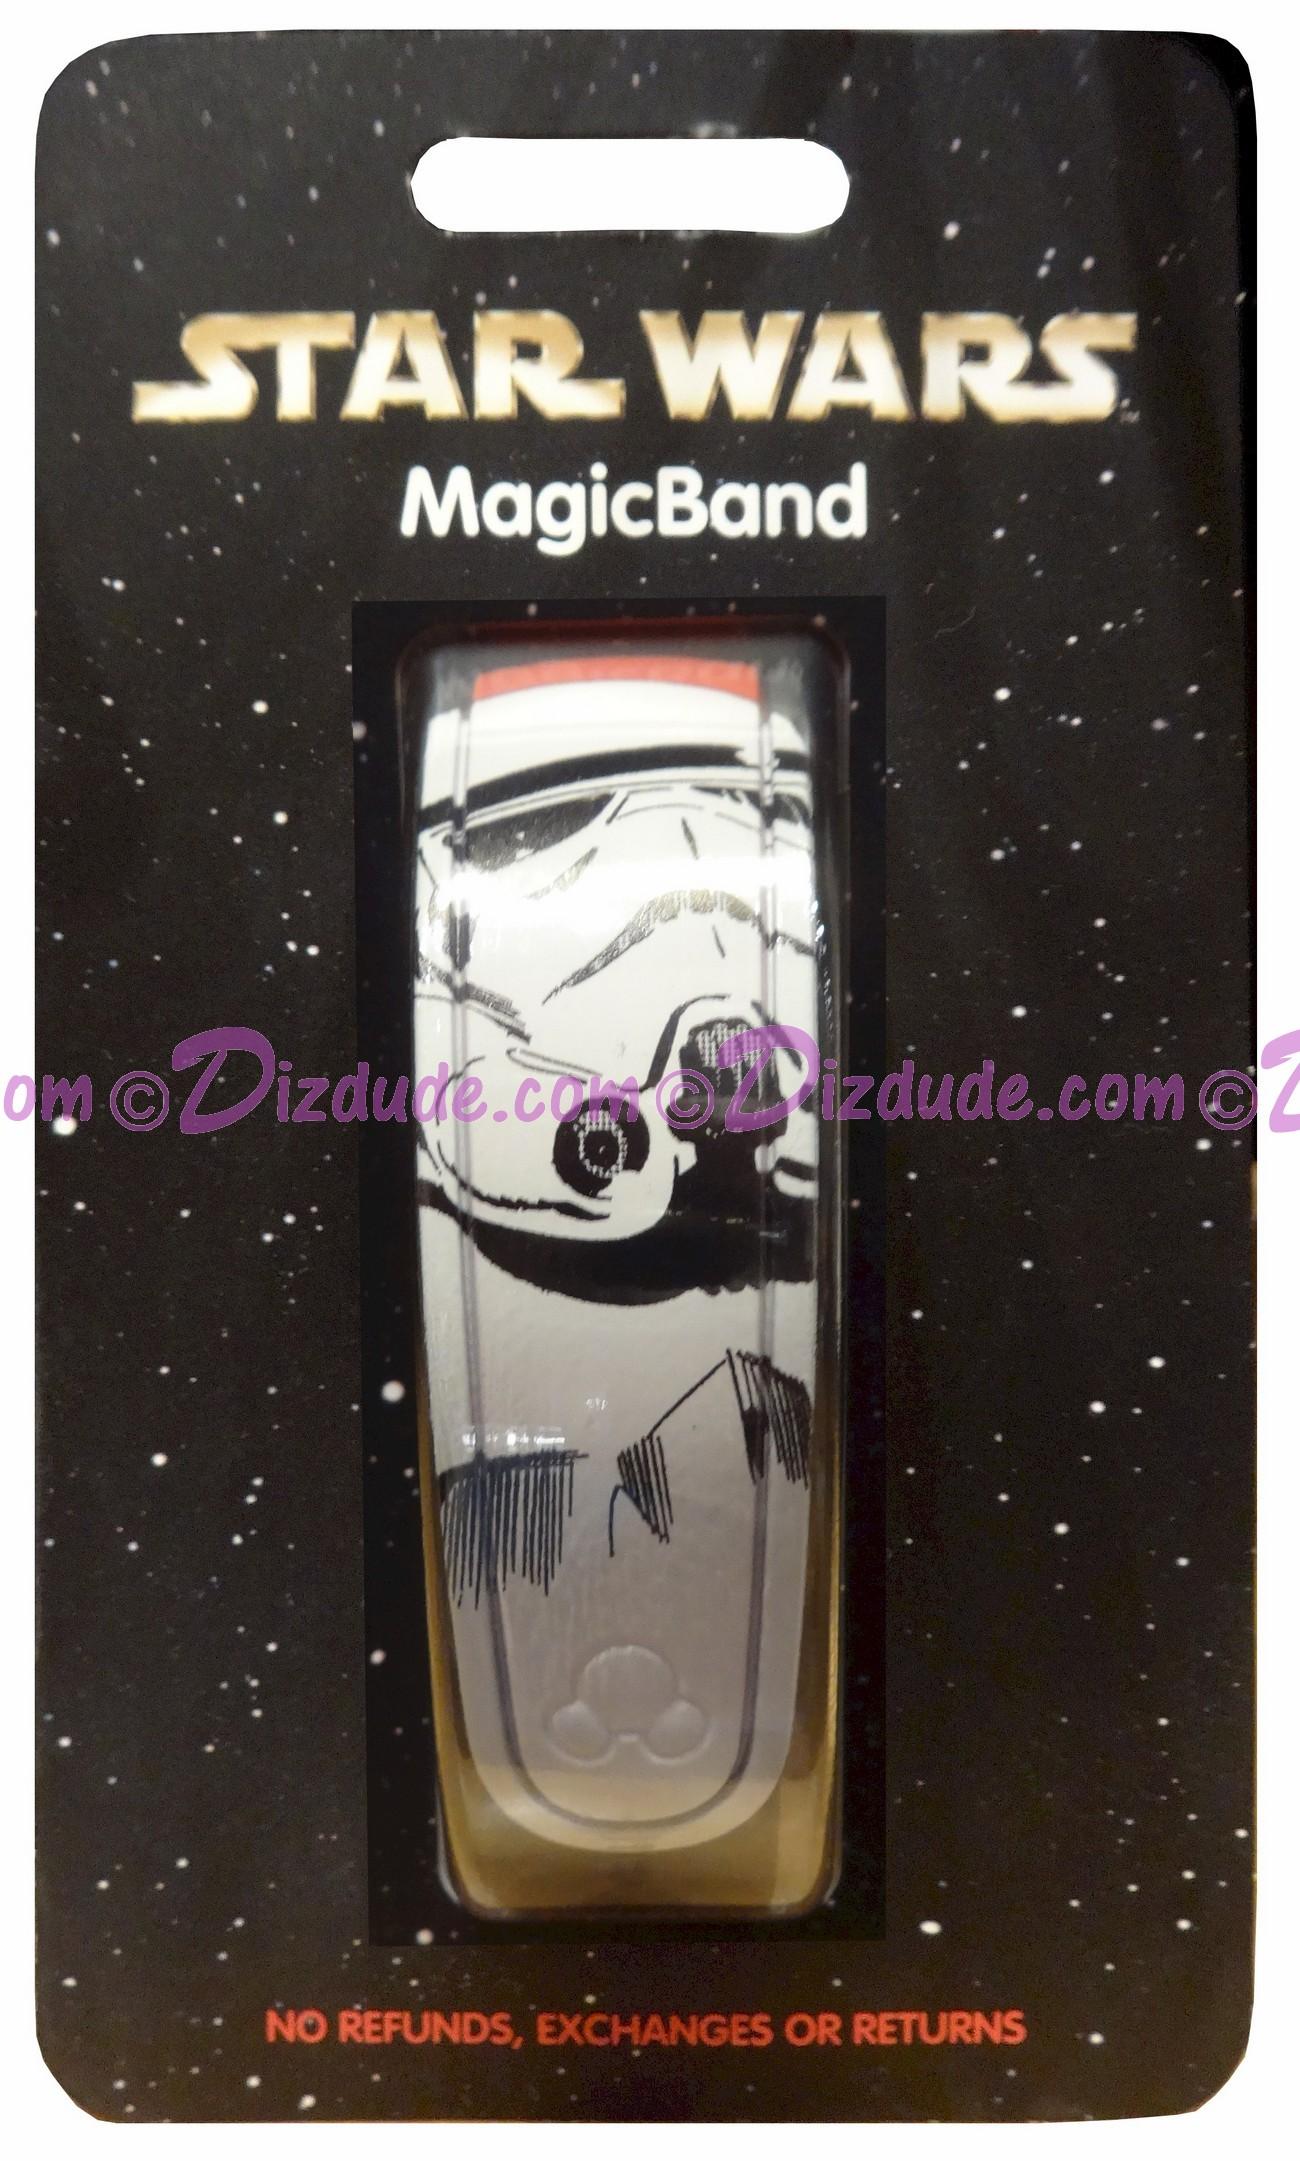 Disney Star Wars Stormtrooper Graphic Magic Band © Dizdude.com